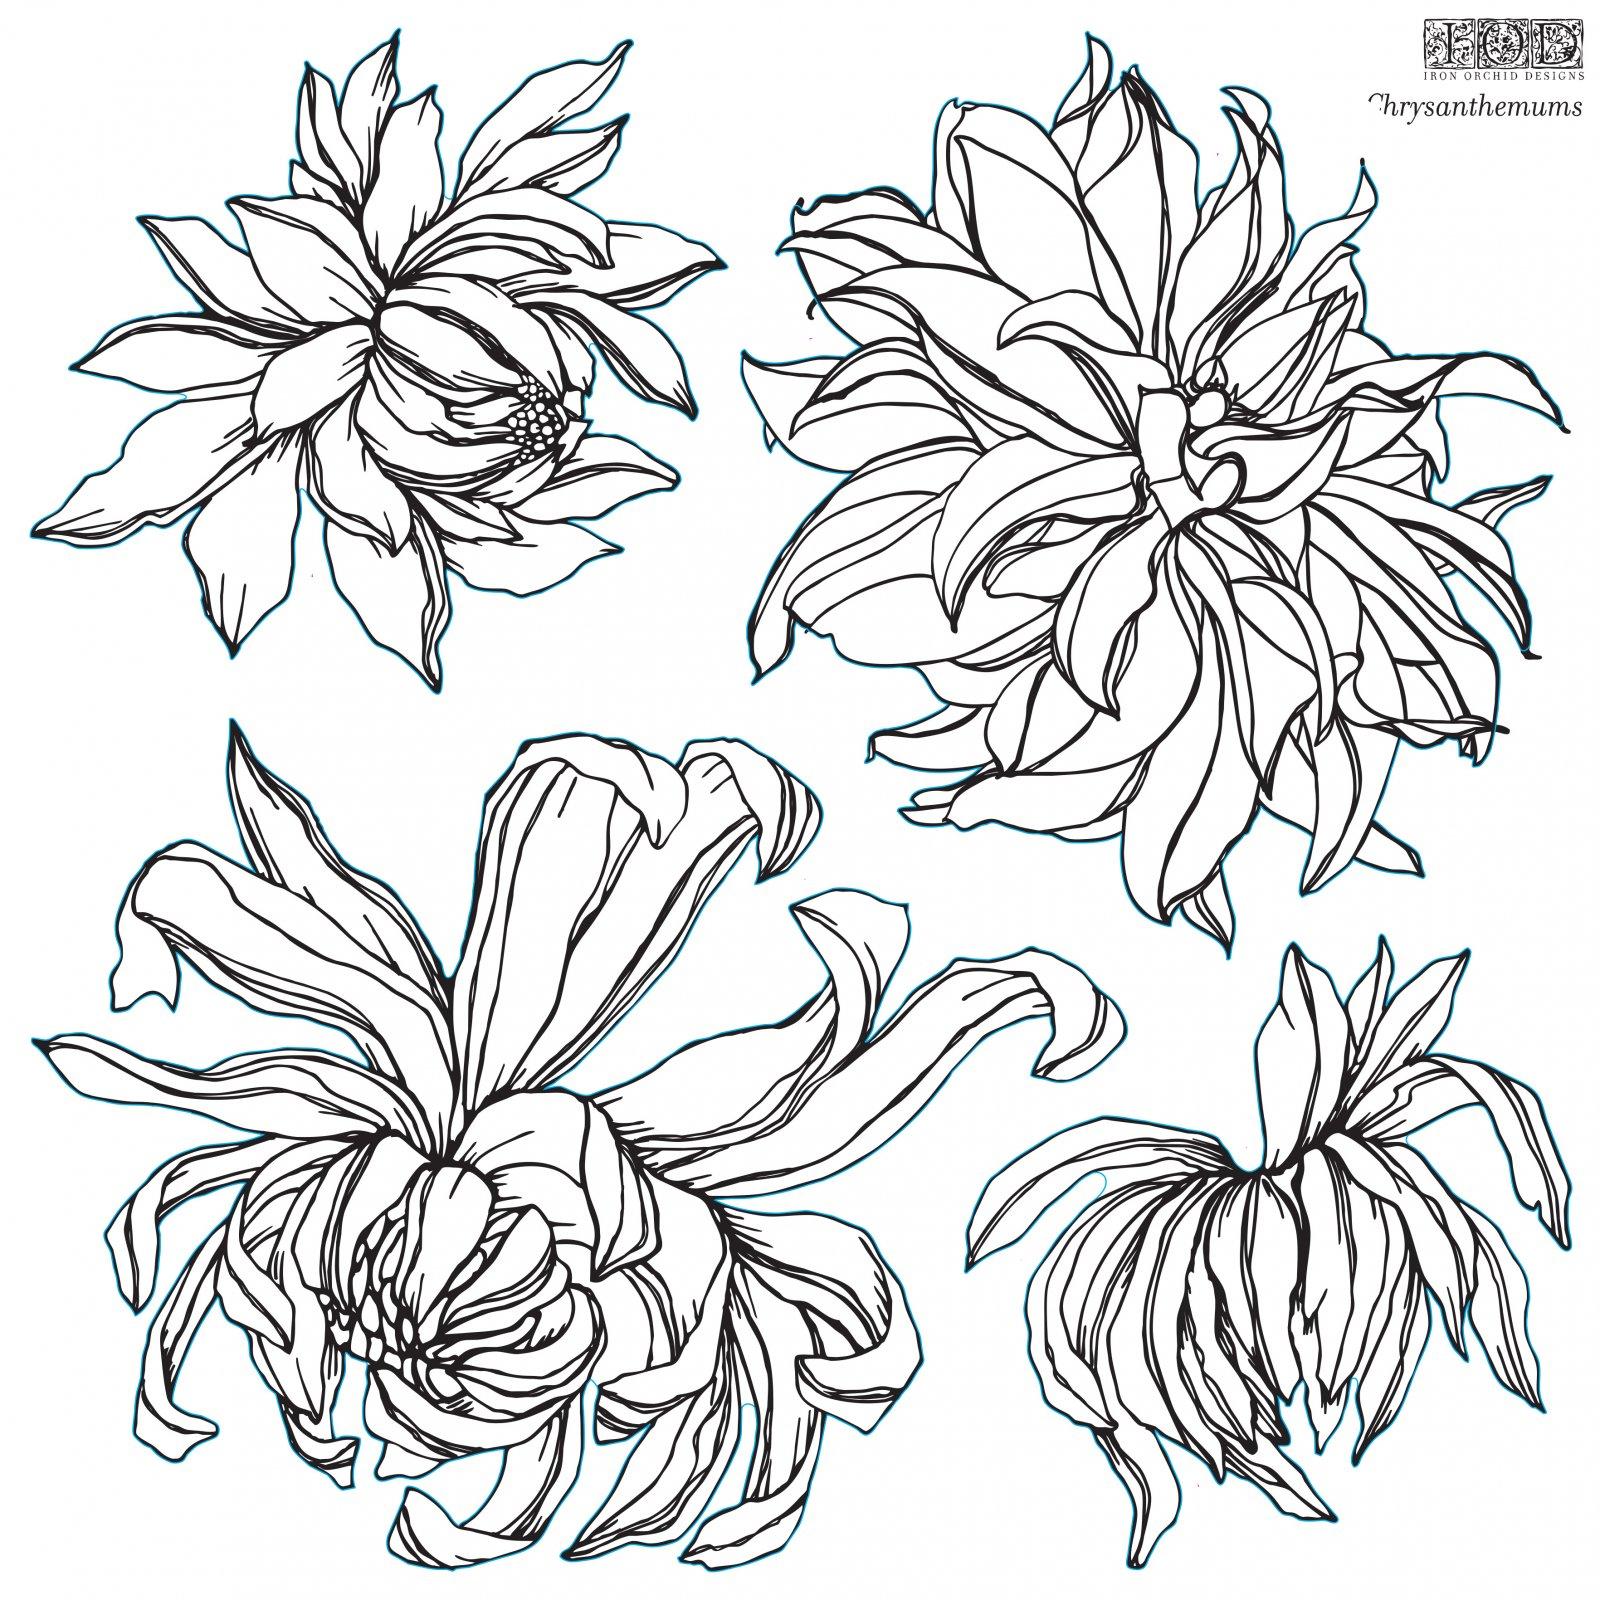 Chrysanthemum 12x12 IOD Stamp